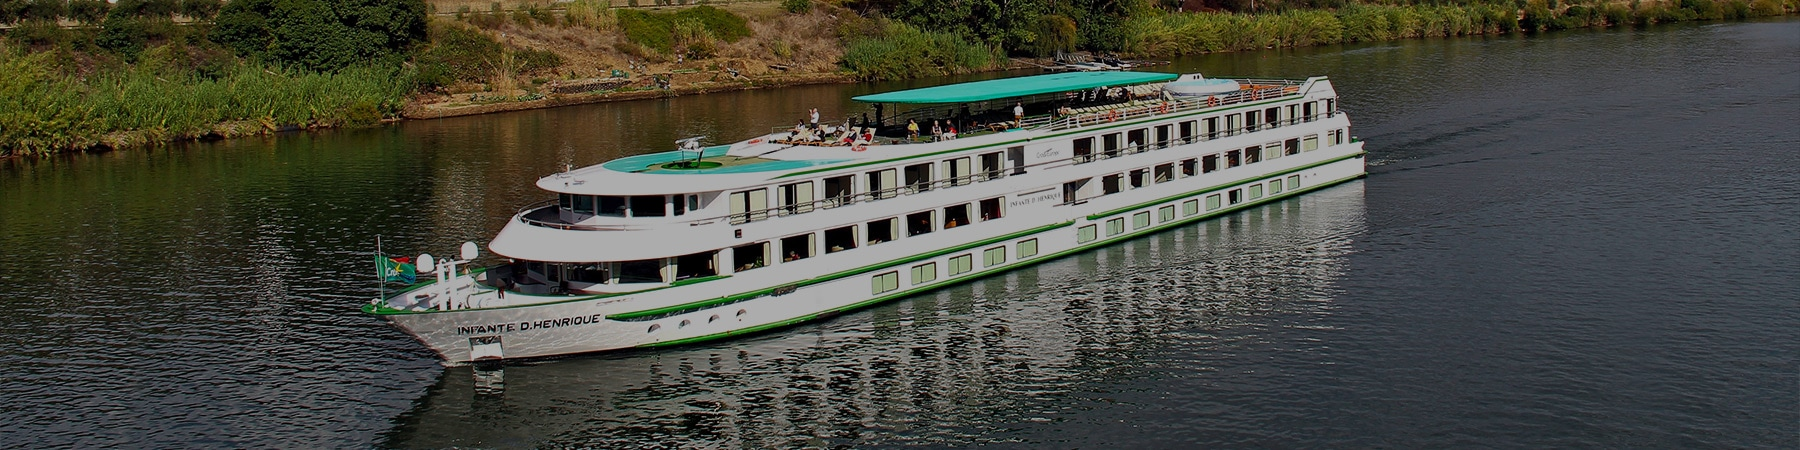 Ship-MSInfanteDonHenrique-Masthead